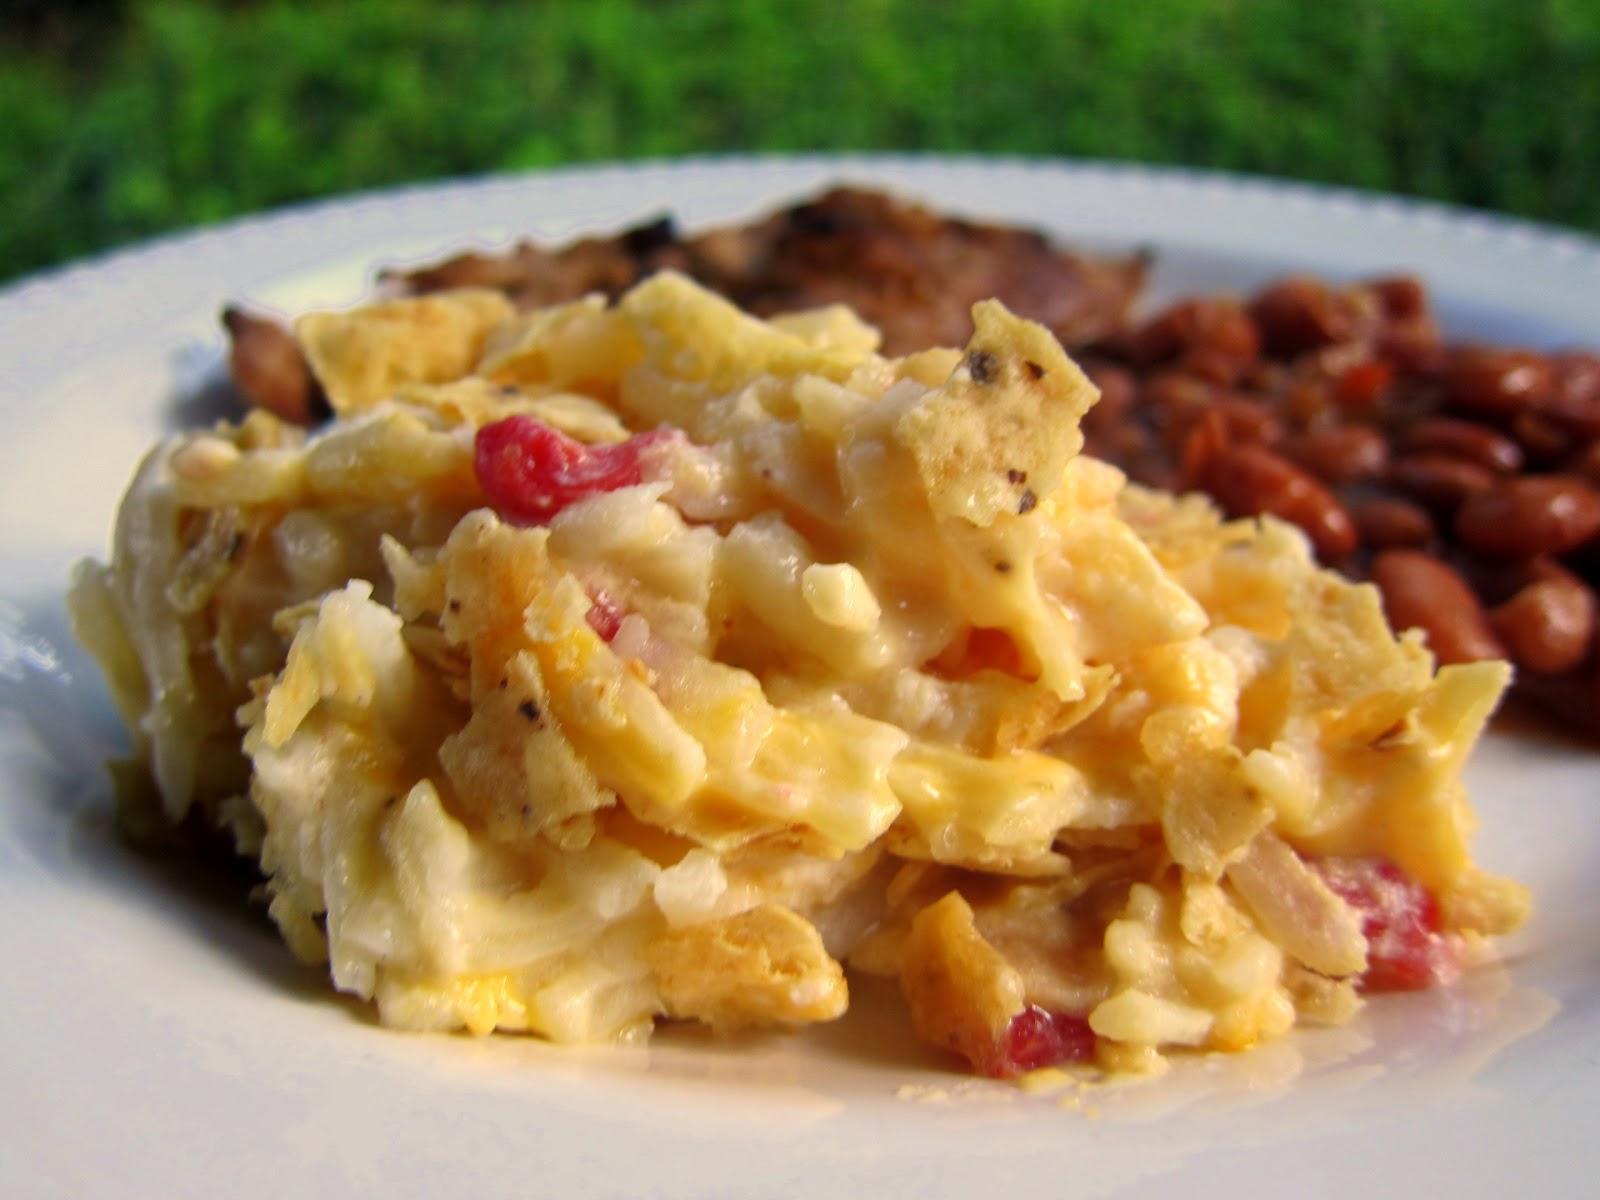 Southwestern Potato Casserole Recipe - creamy potato casserole with ...